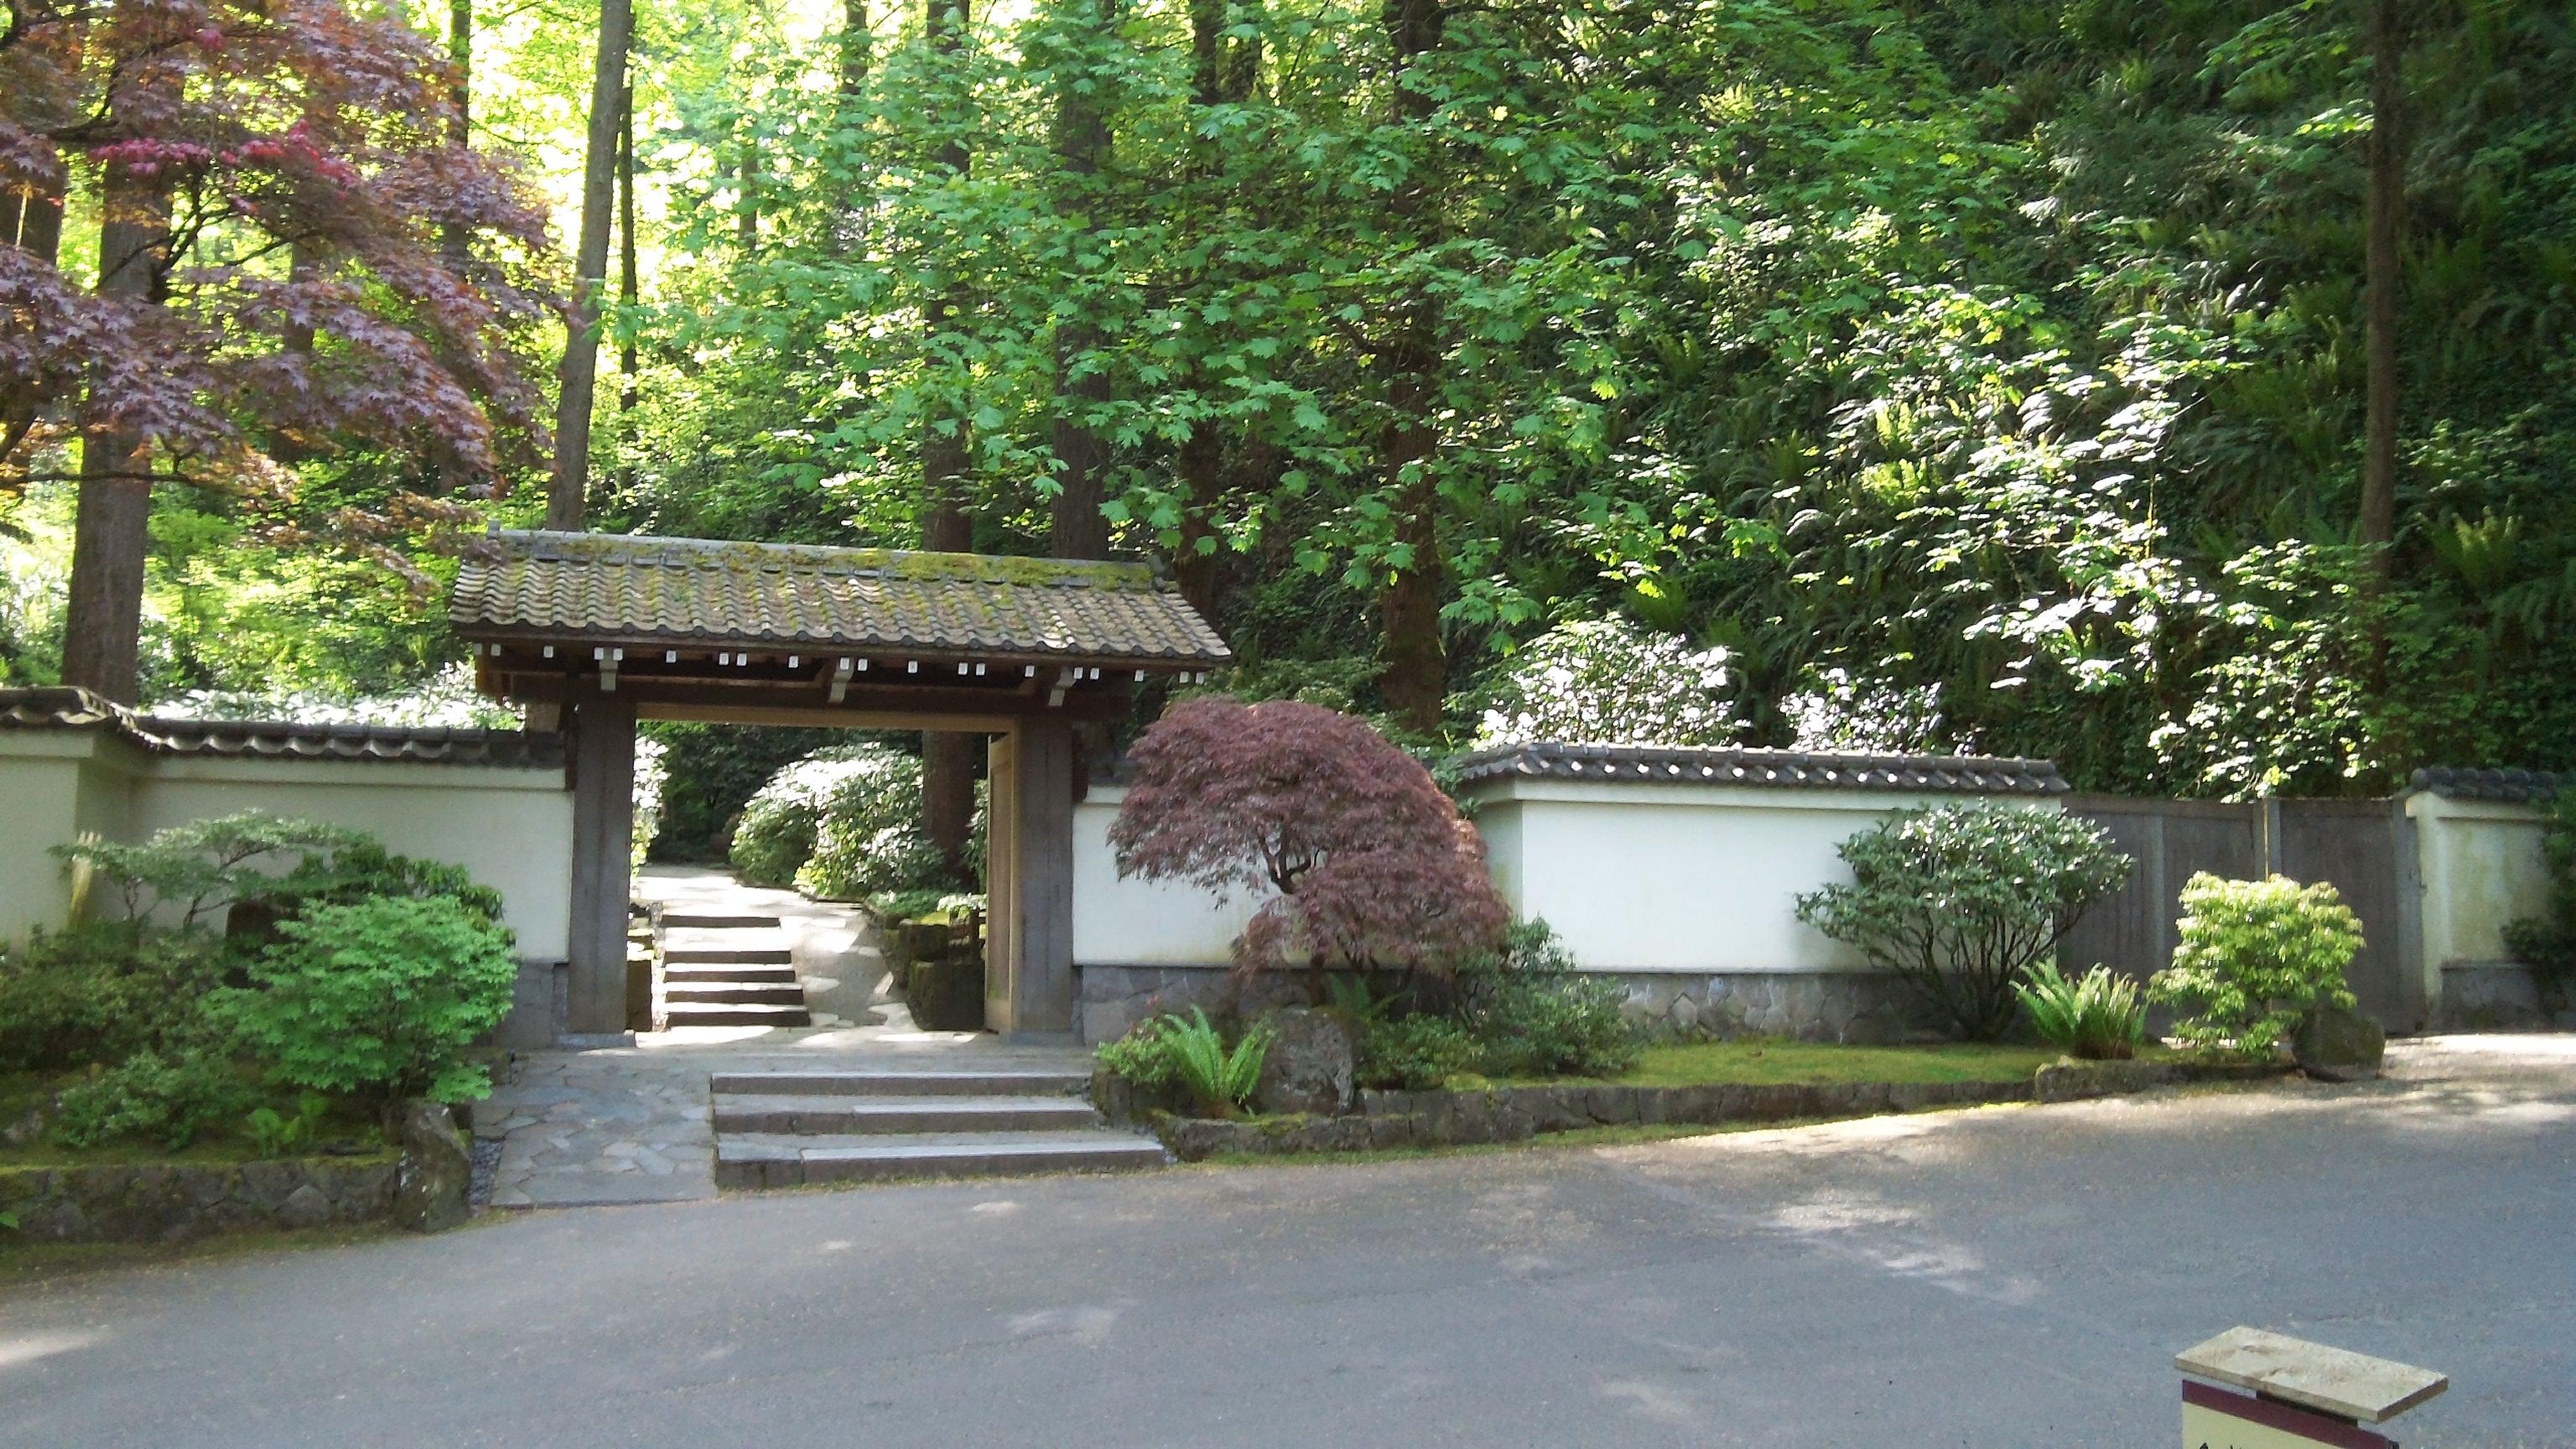 Southwest Portland Park - The Portland Japanese Garden (main entrance) at Washington Park